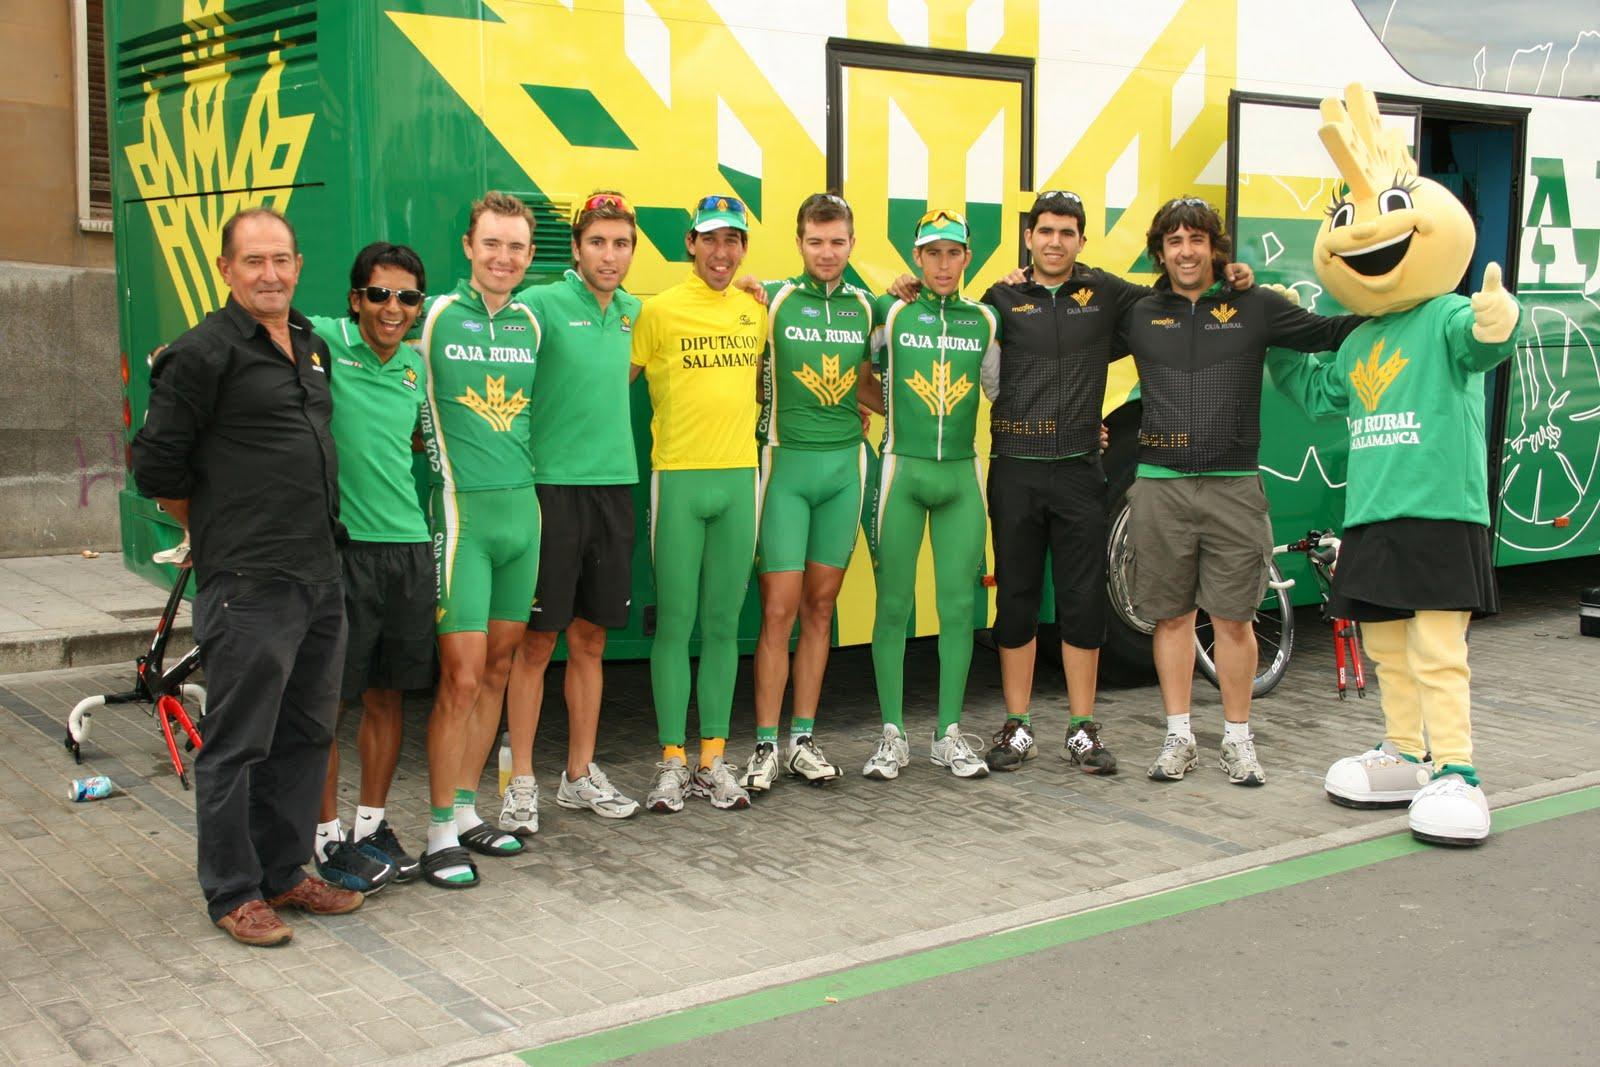 Equipo ciclista caja rural for Caja rural de salamanca oficinas